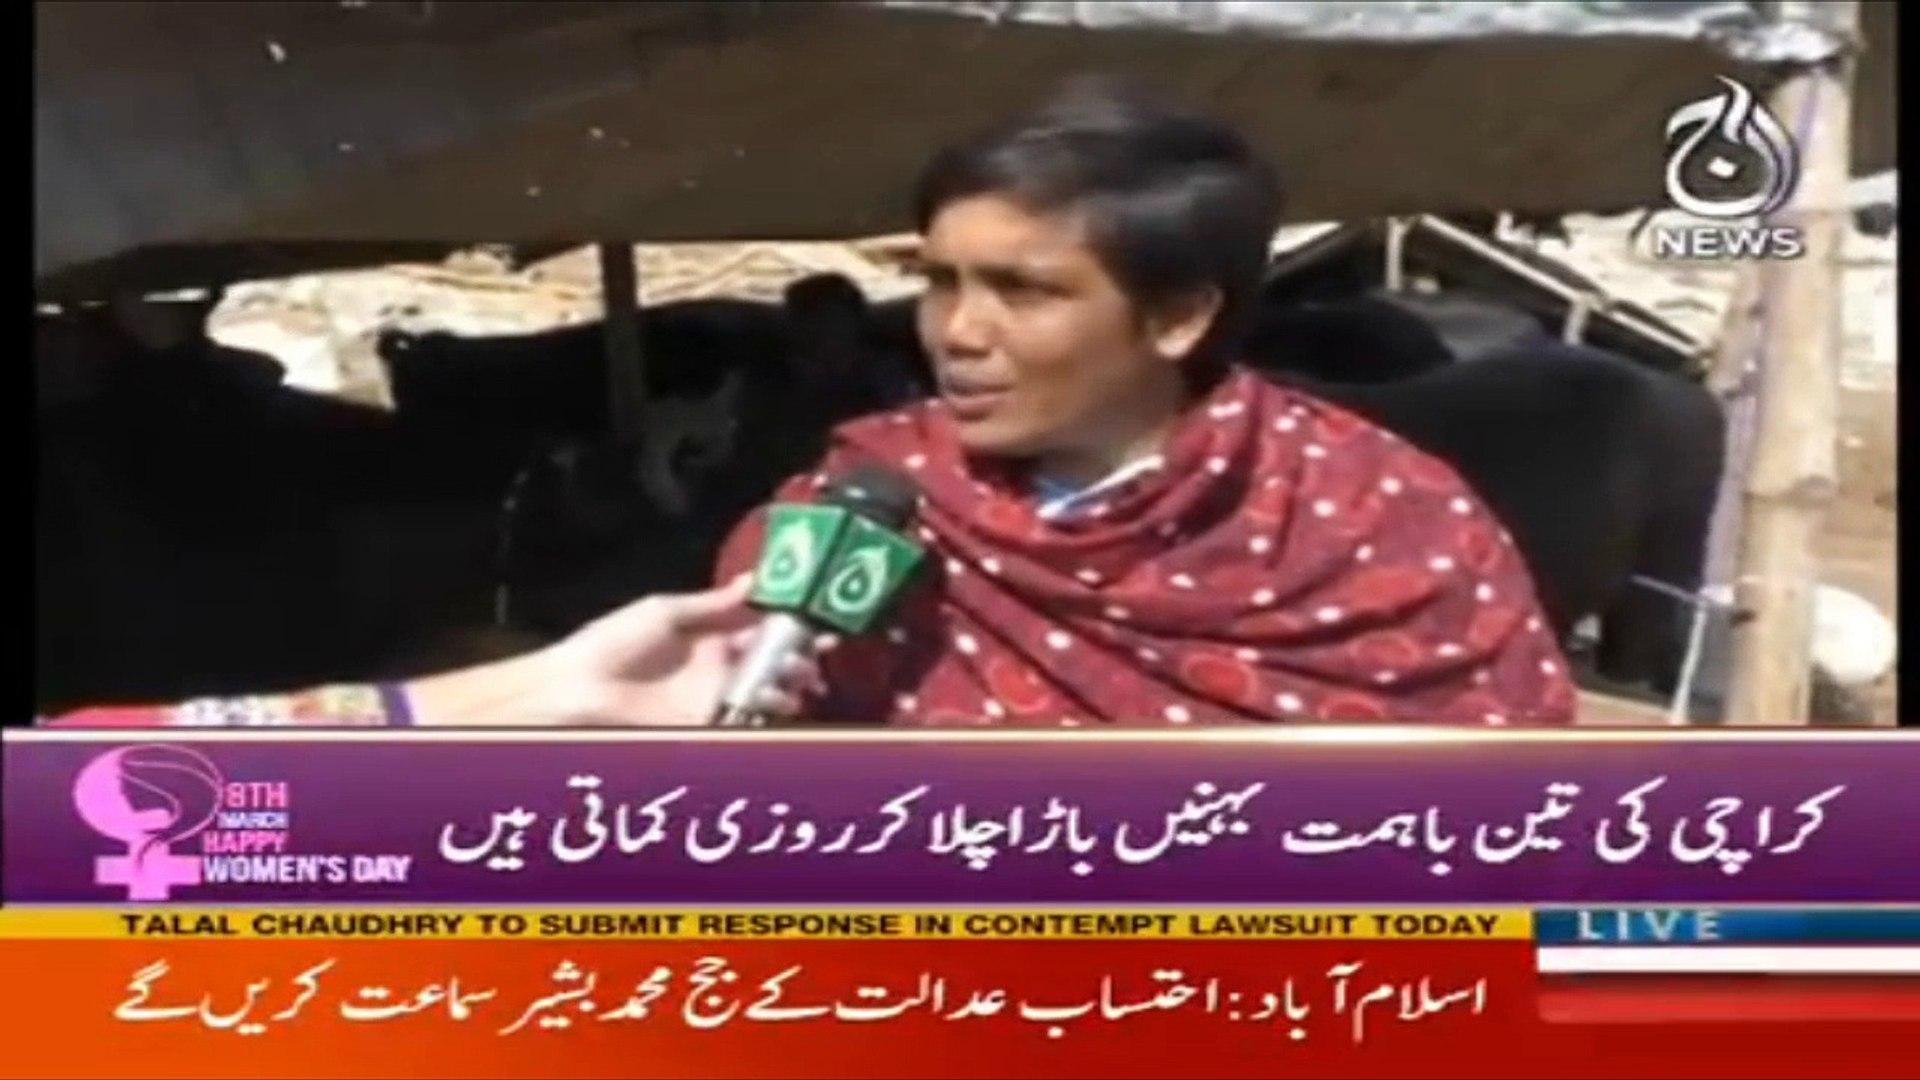 Aaj News Salute these three hard working daughters of Karachi Happy International Women's Day |